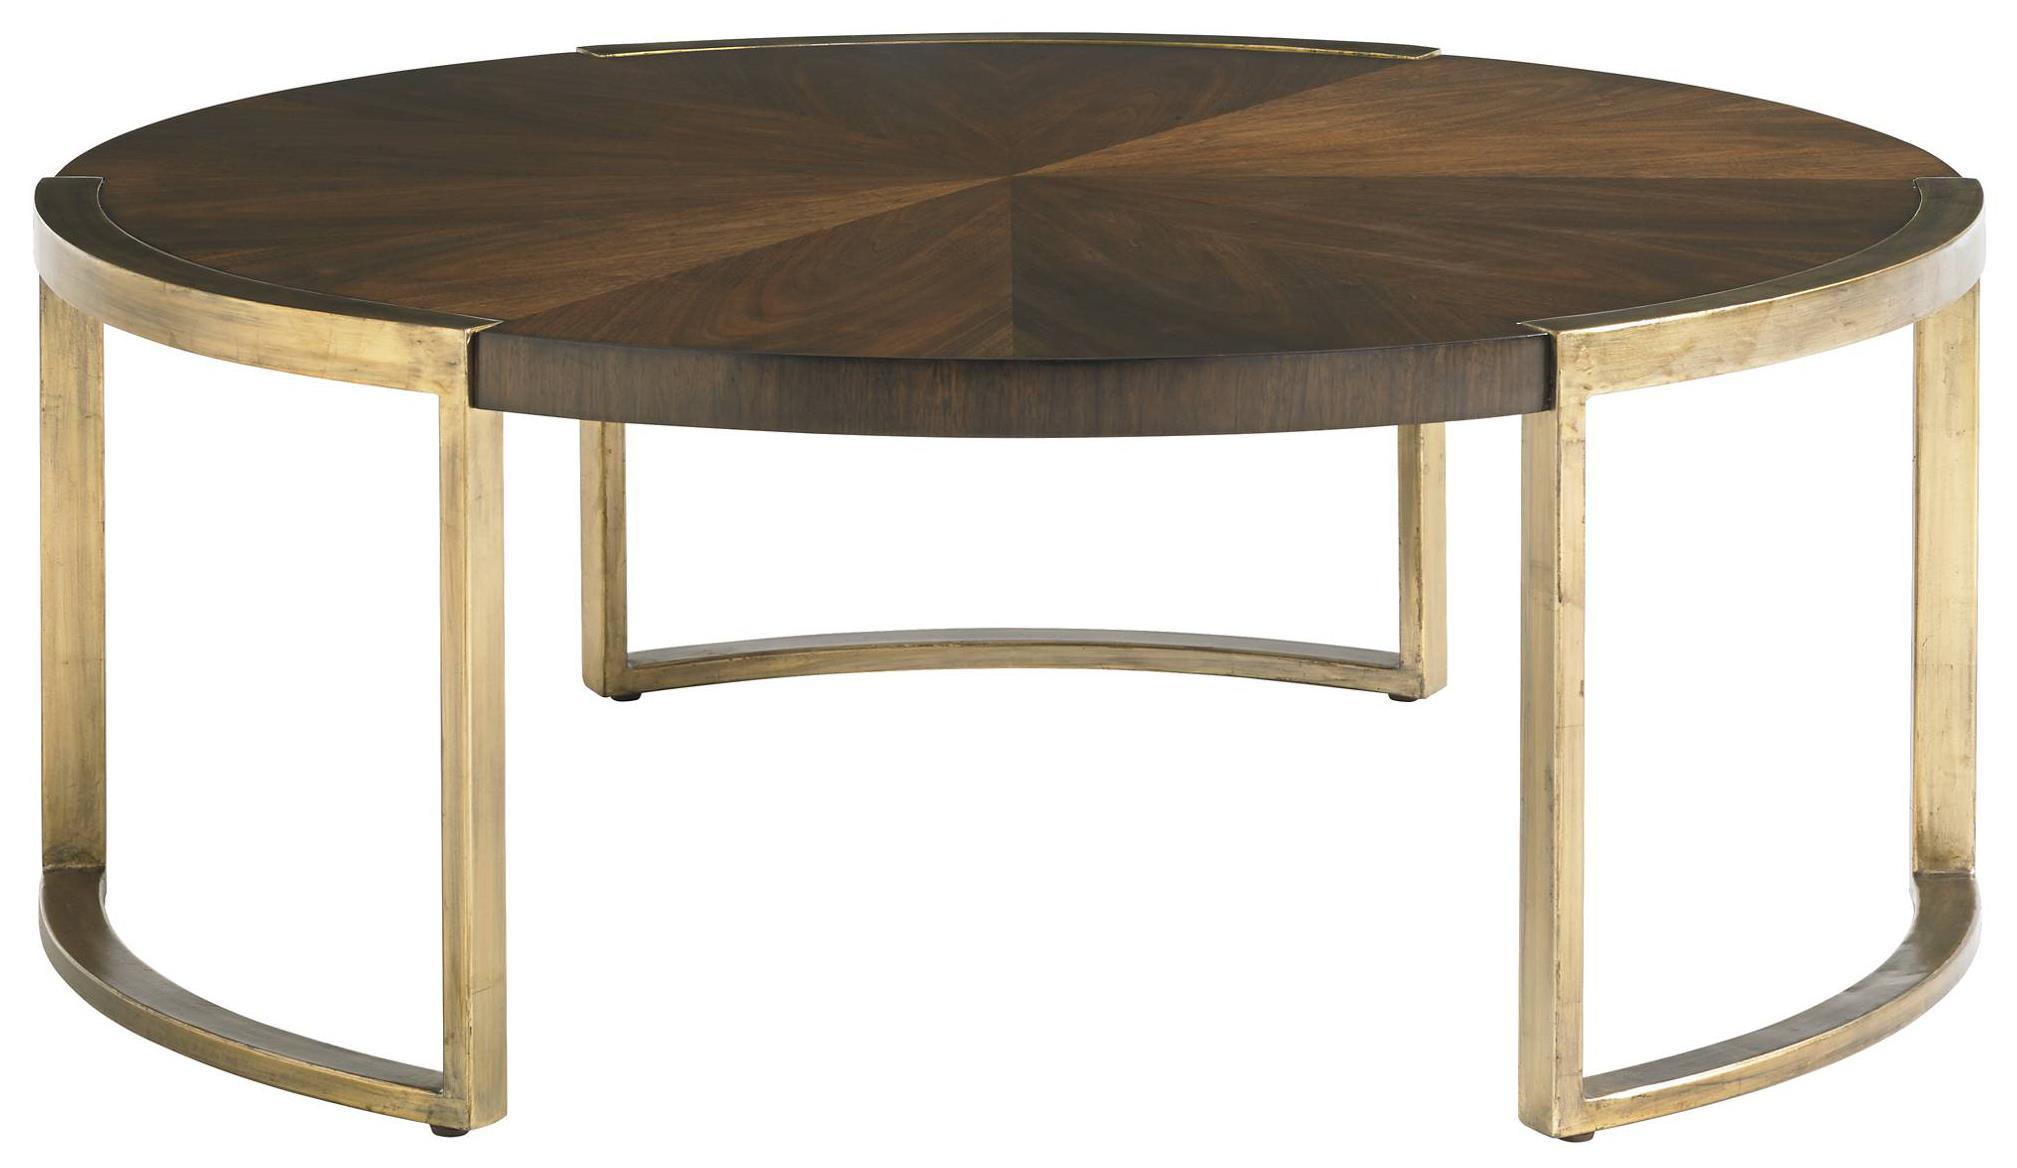 Stanley Furniture Crestaire 436 15 01 Mid Century Modern Autry Round Cocktail Table With Walnut